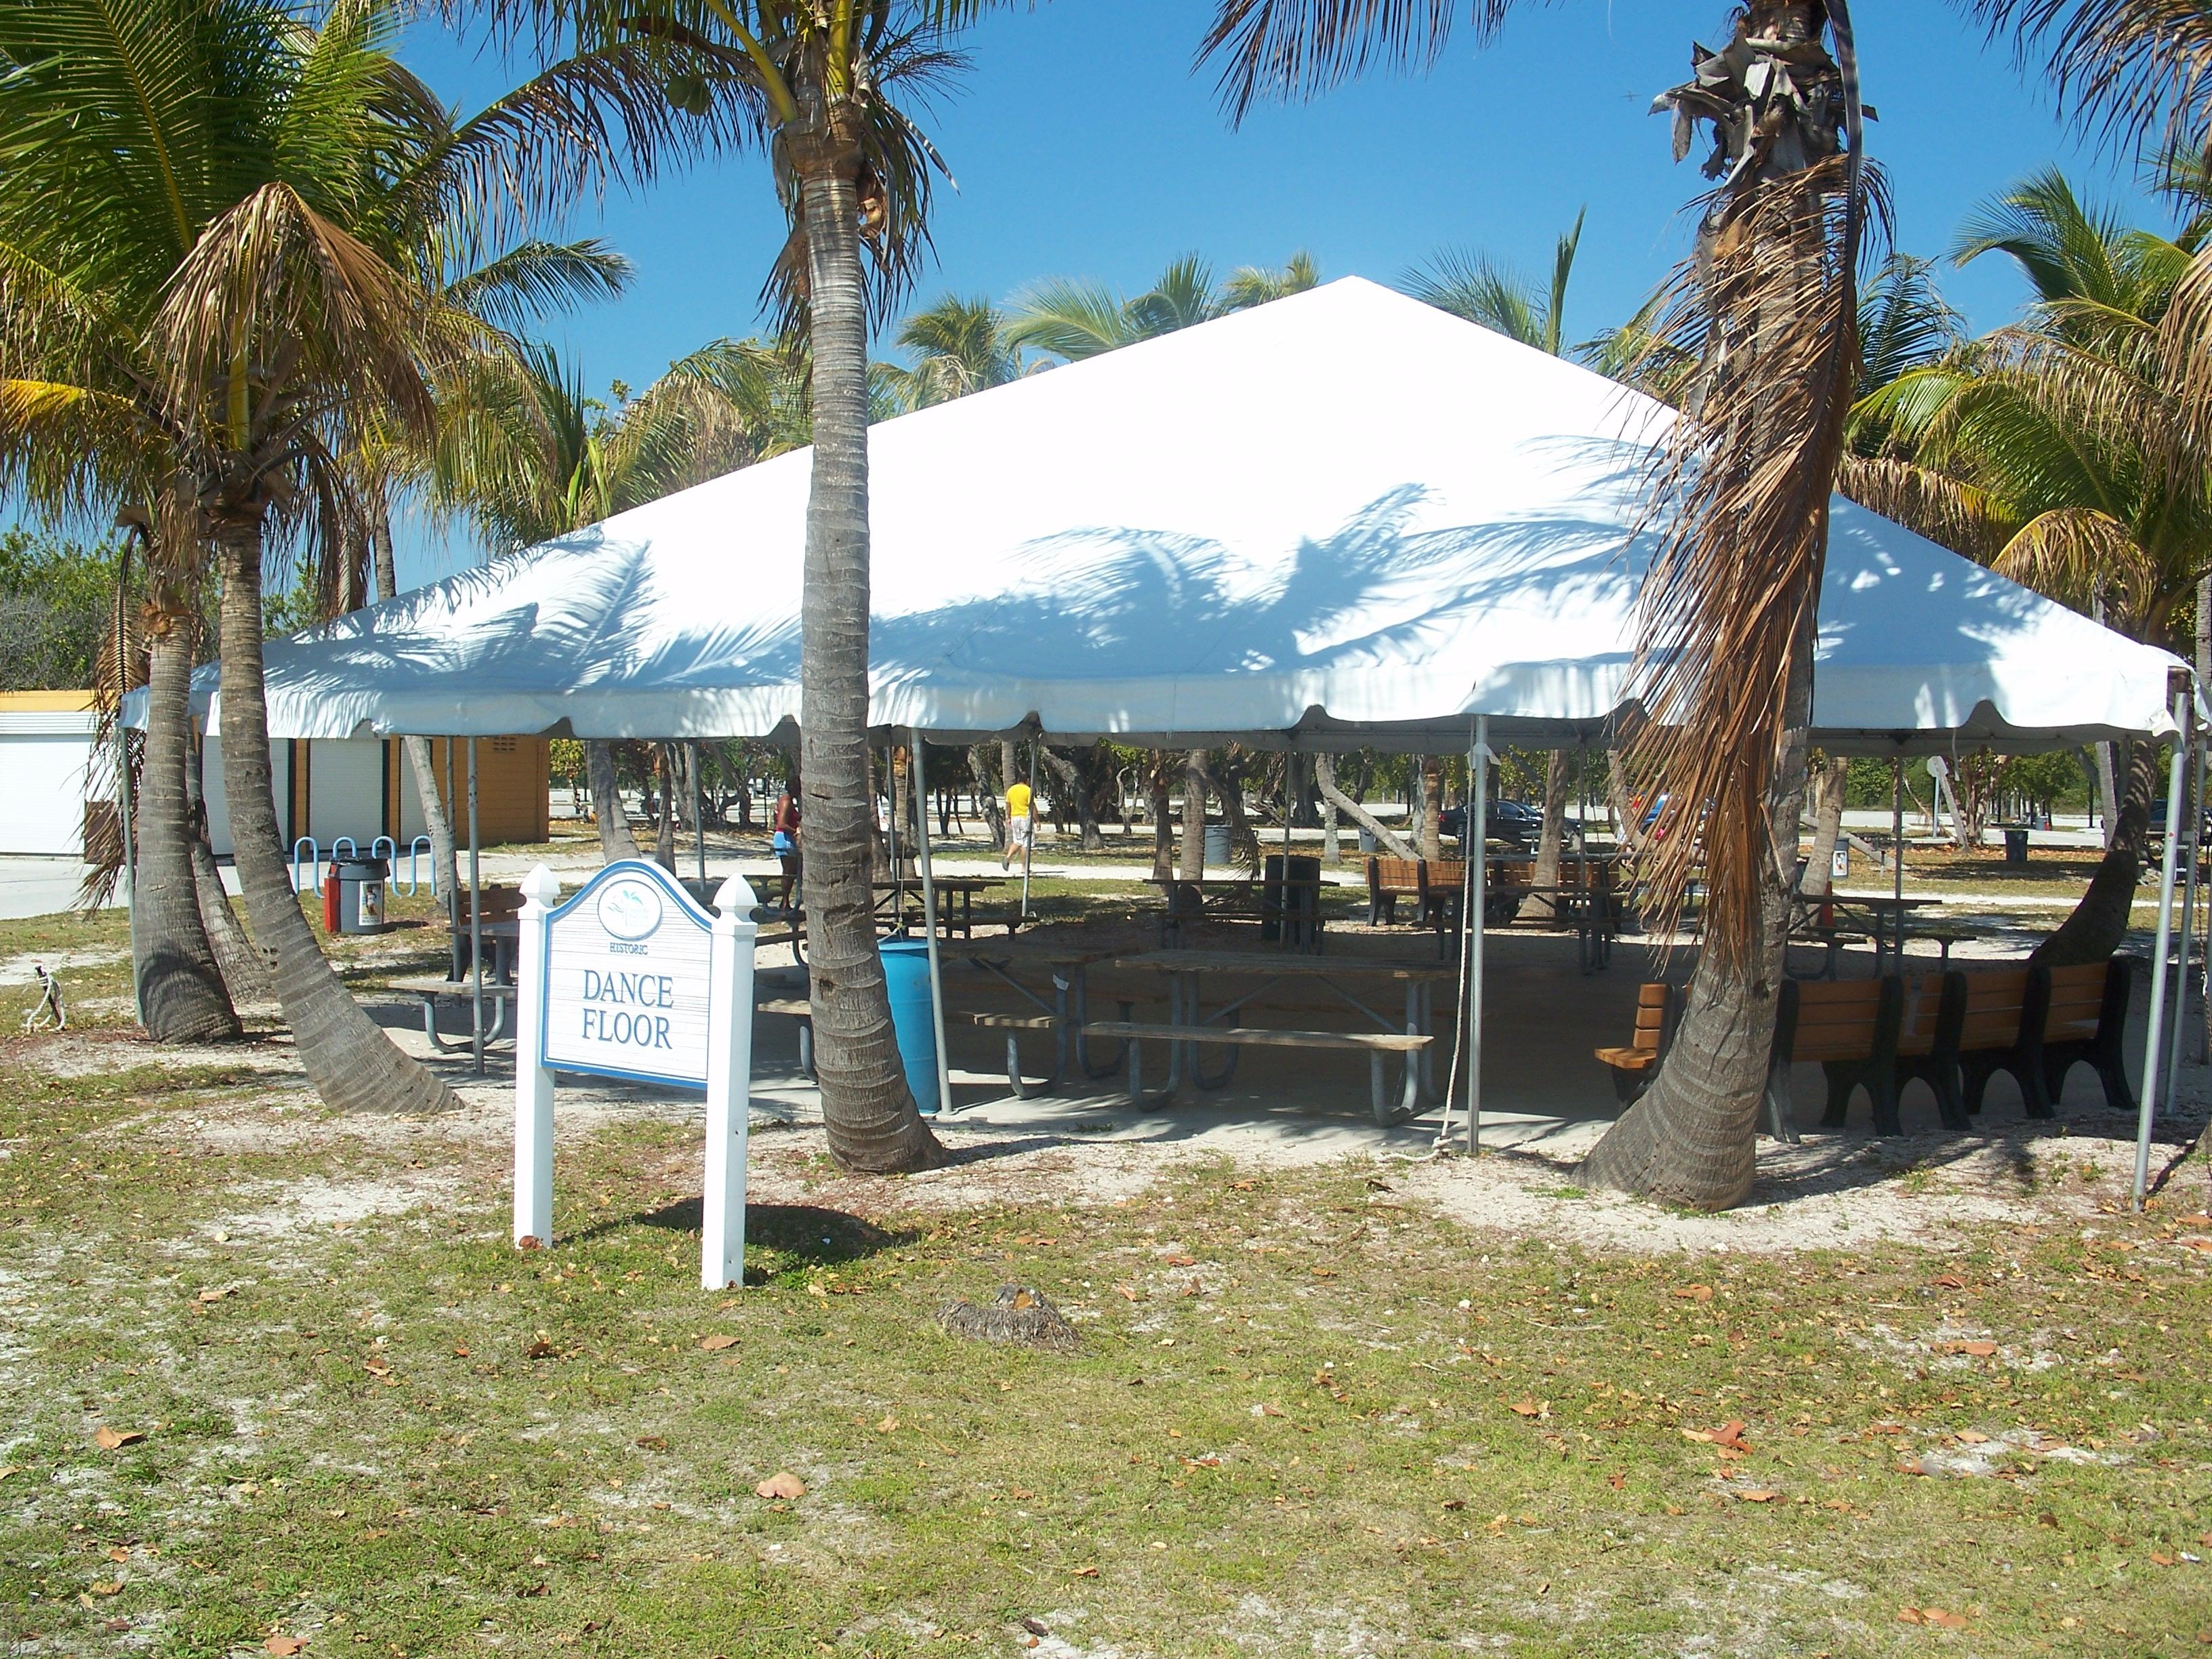 Virginia Beach Miami Fl The Best Beaches In World